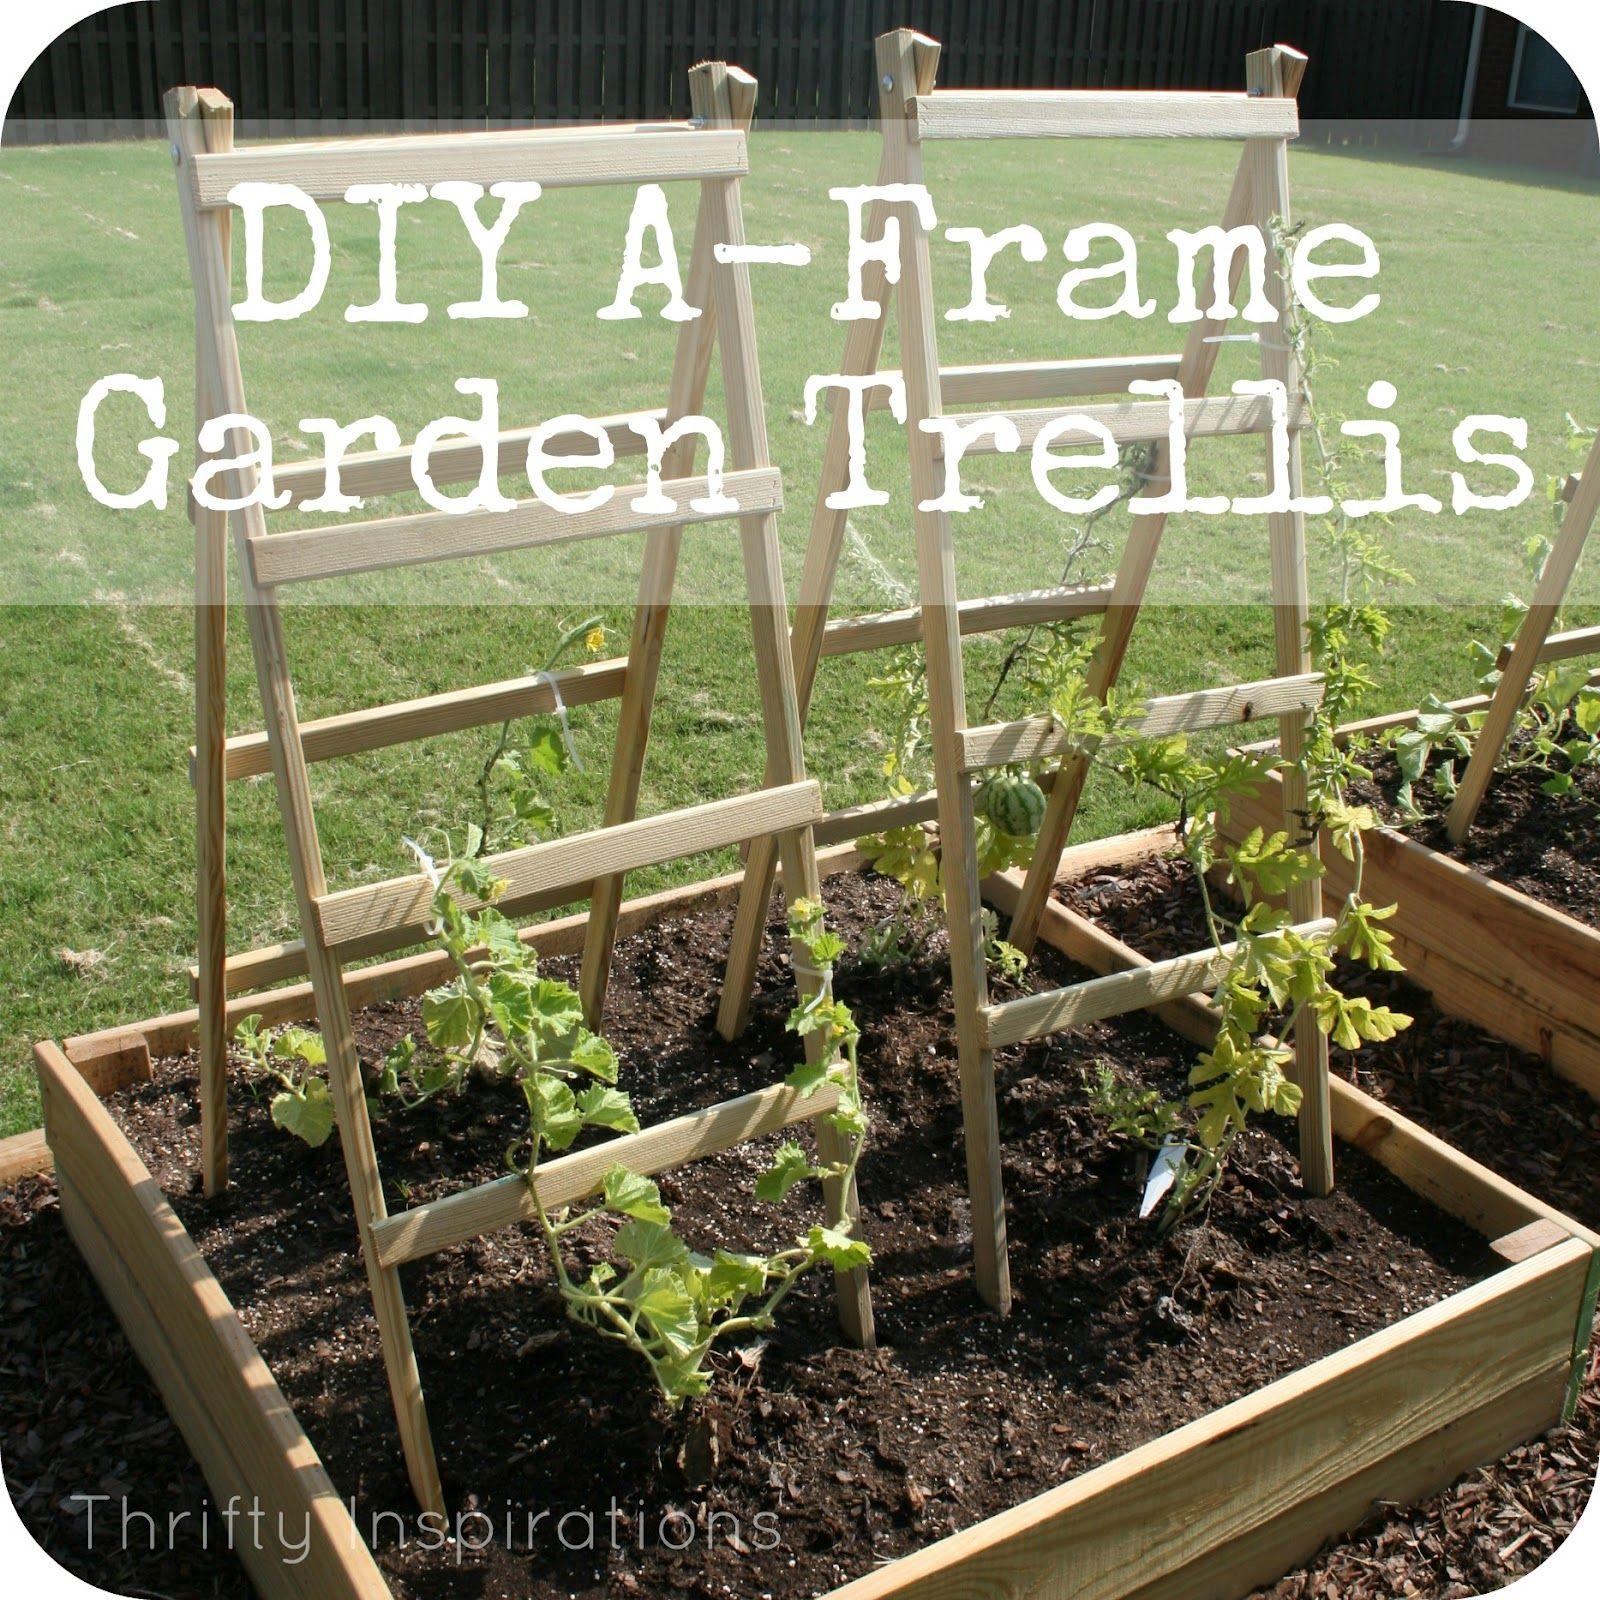 Thrifty Inspirations: DIY A-Frame Garden Trellis | * Home Ideas ...